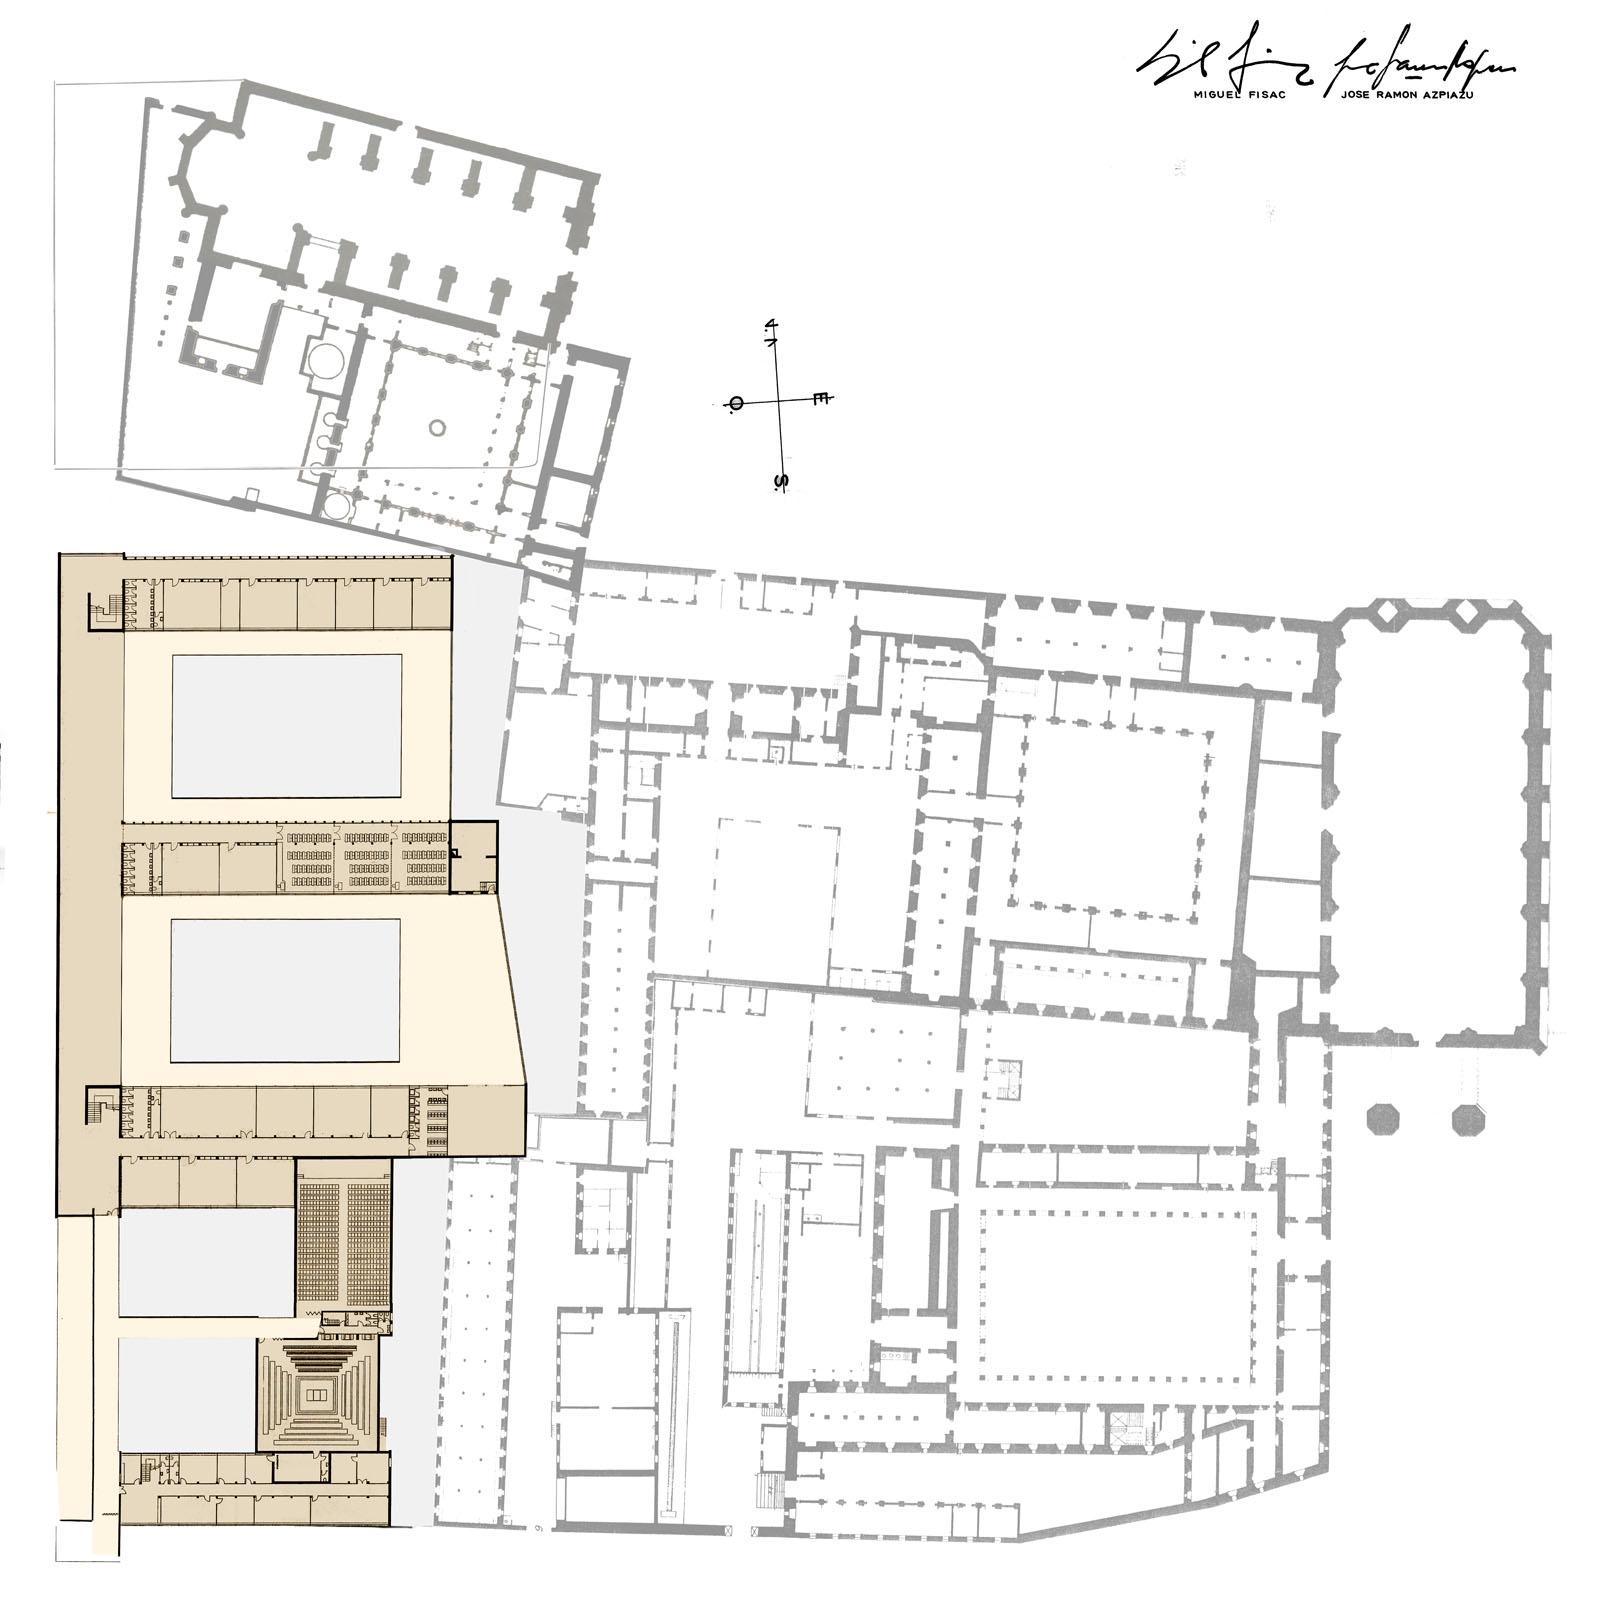 danielvillalobos-huesosfisac-miguelfisac-modernarchitecture-10